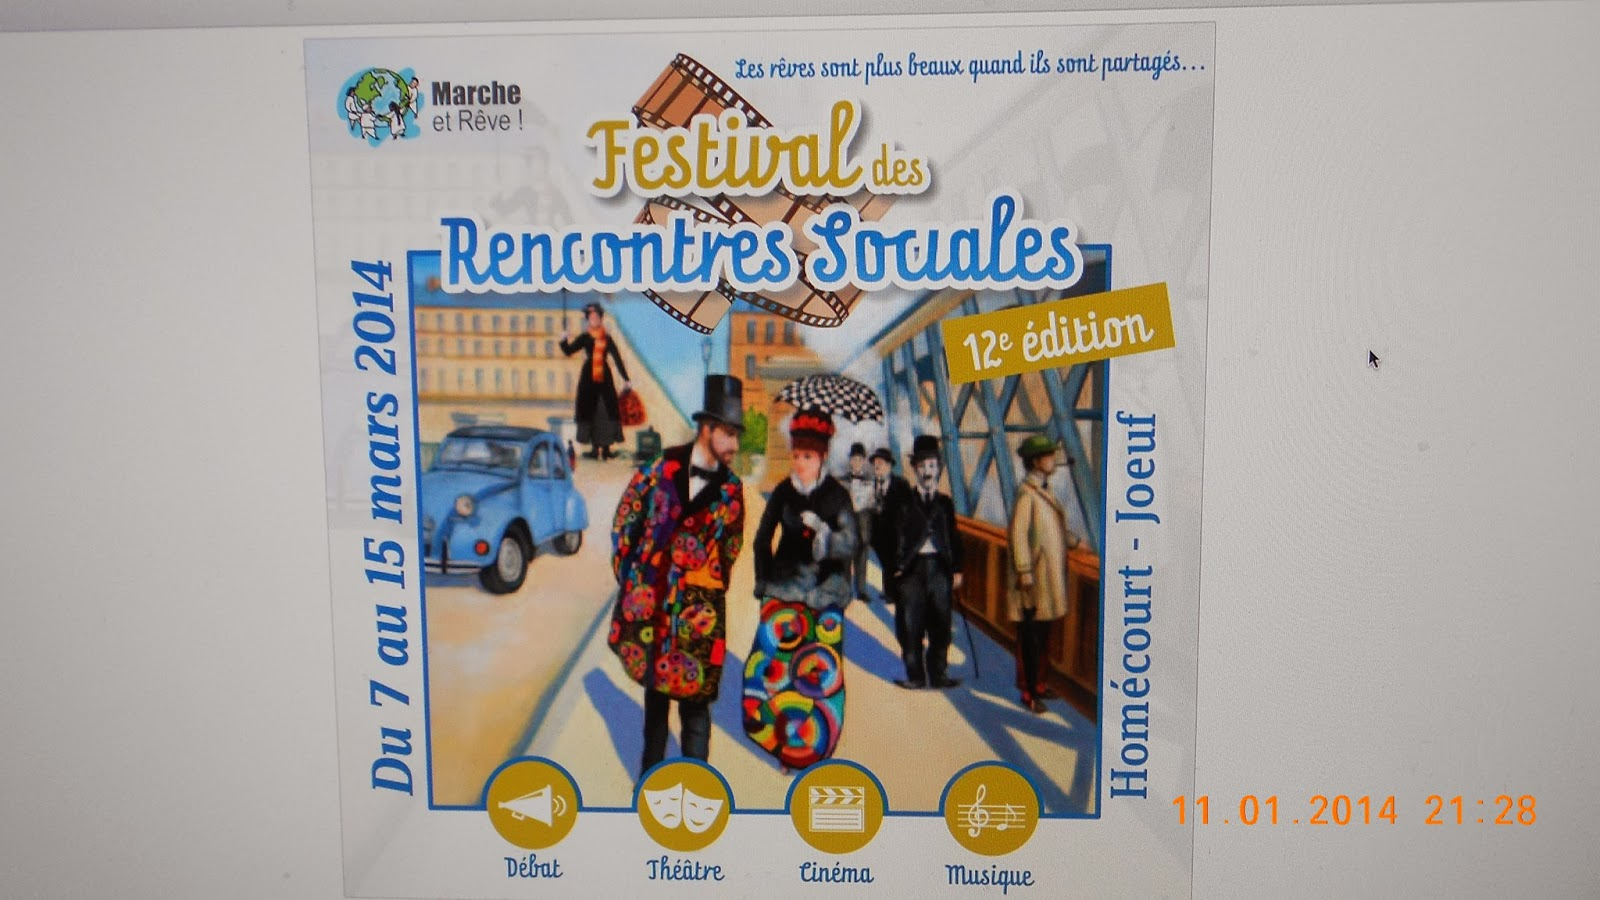 Festival des rencontres sociales joeuf